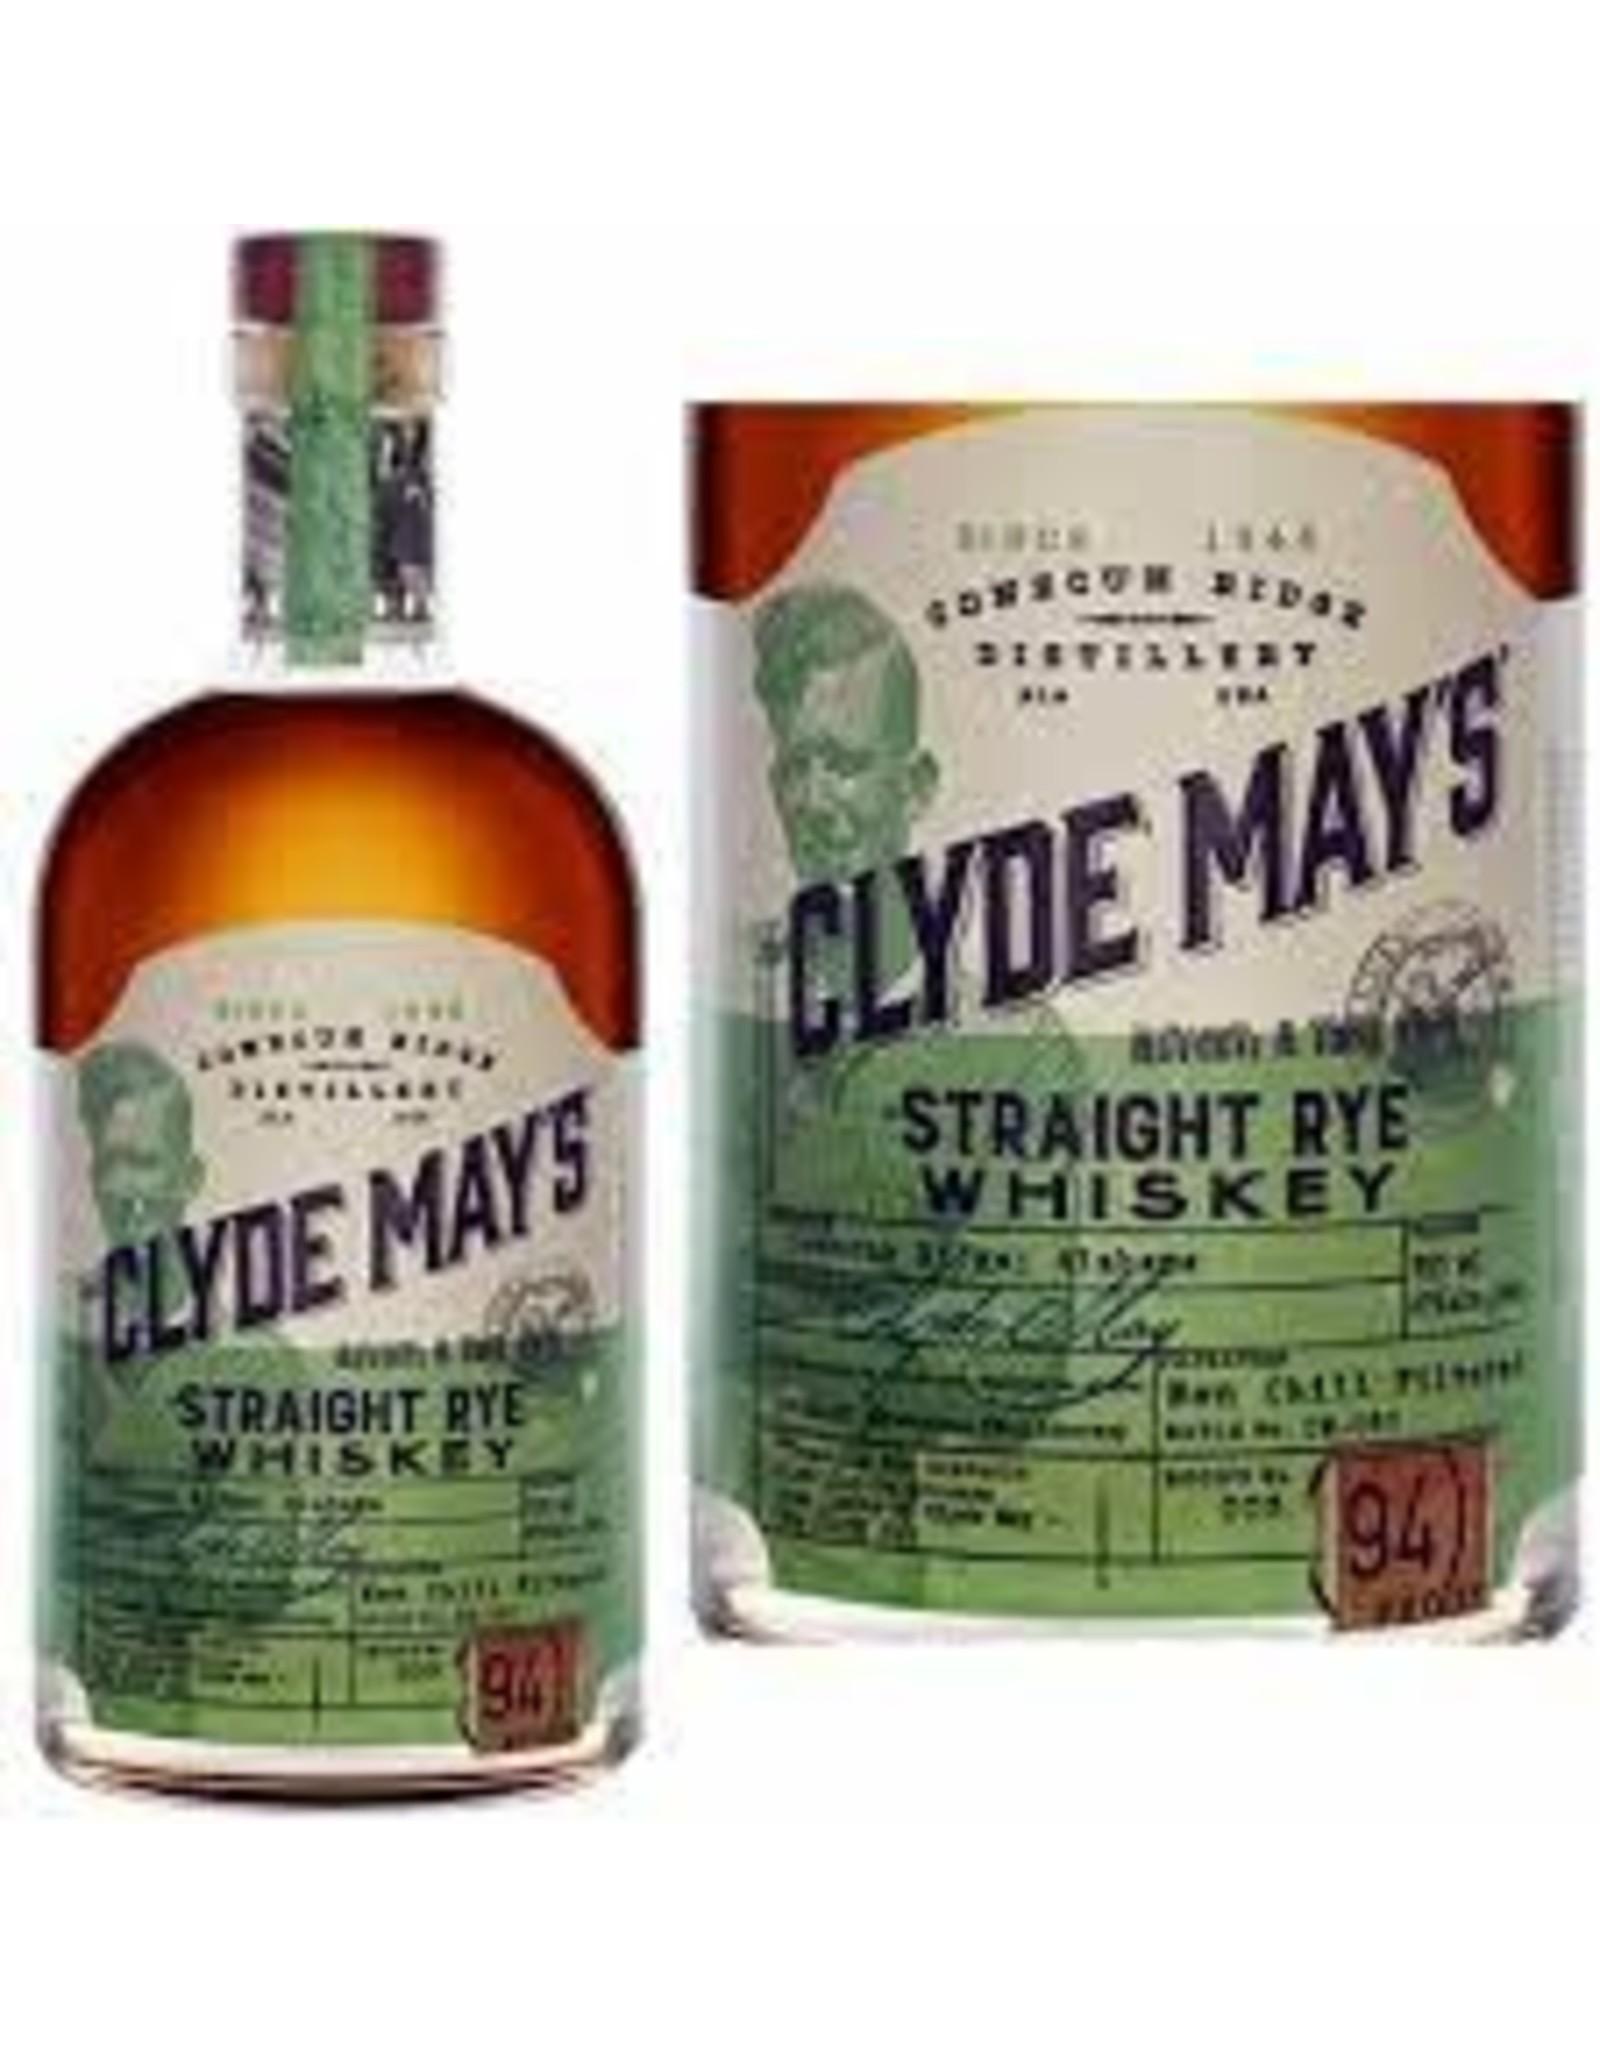 CLYDE MAYS STRAIGHT RYE 750ML